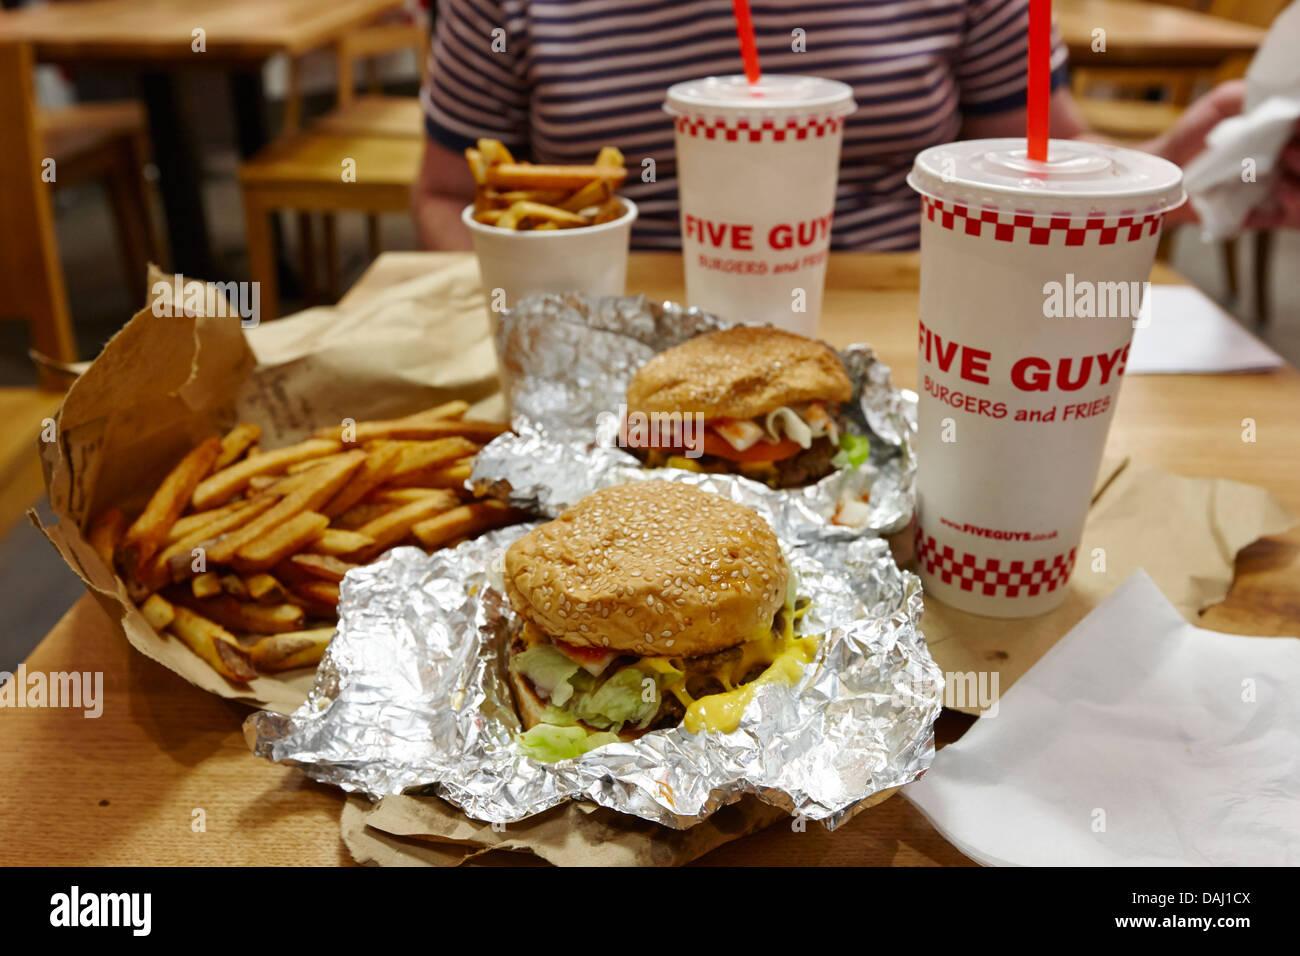 Burger und Pommes frites aus fünf Jungs Burger-Restaurant im Covent Garden in London, England uk neu eröffnet Stockbild